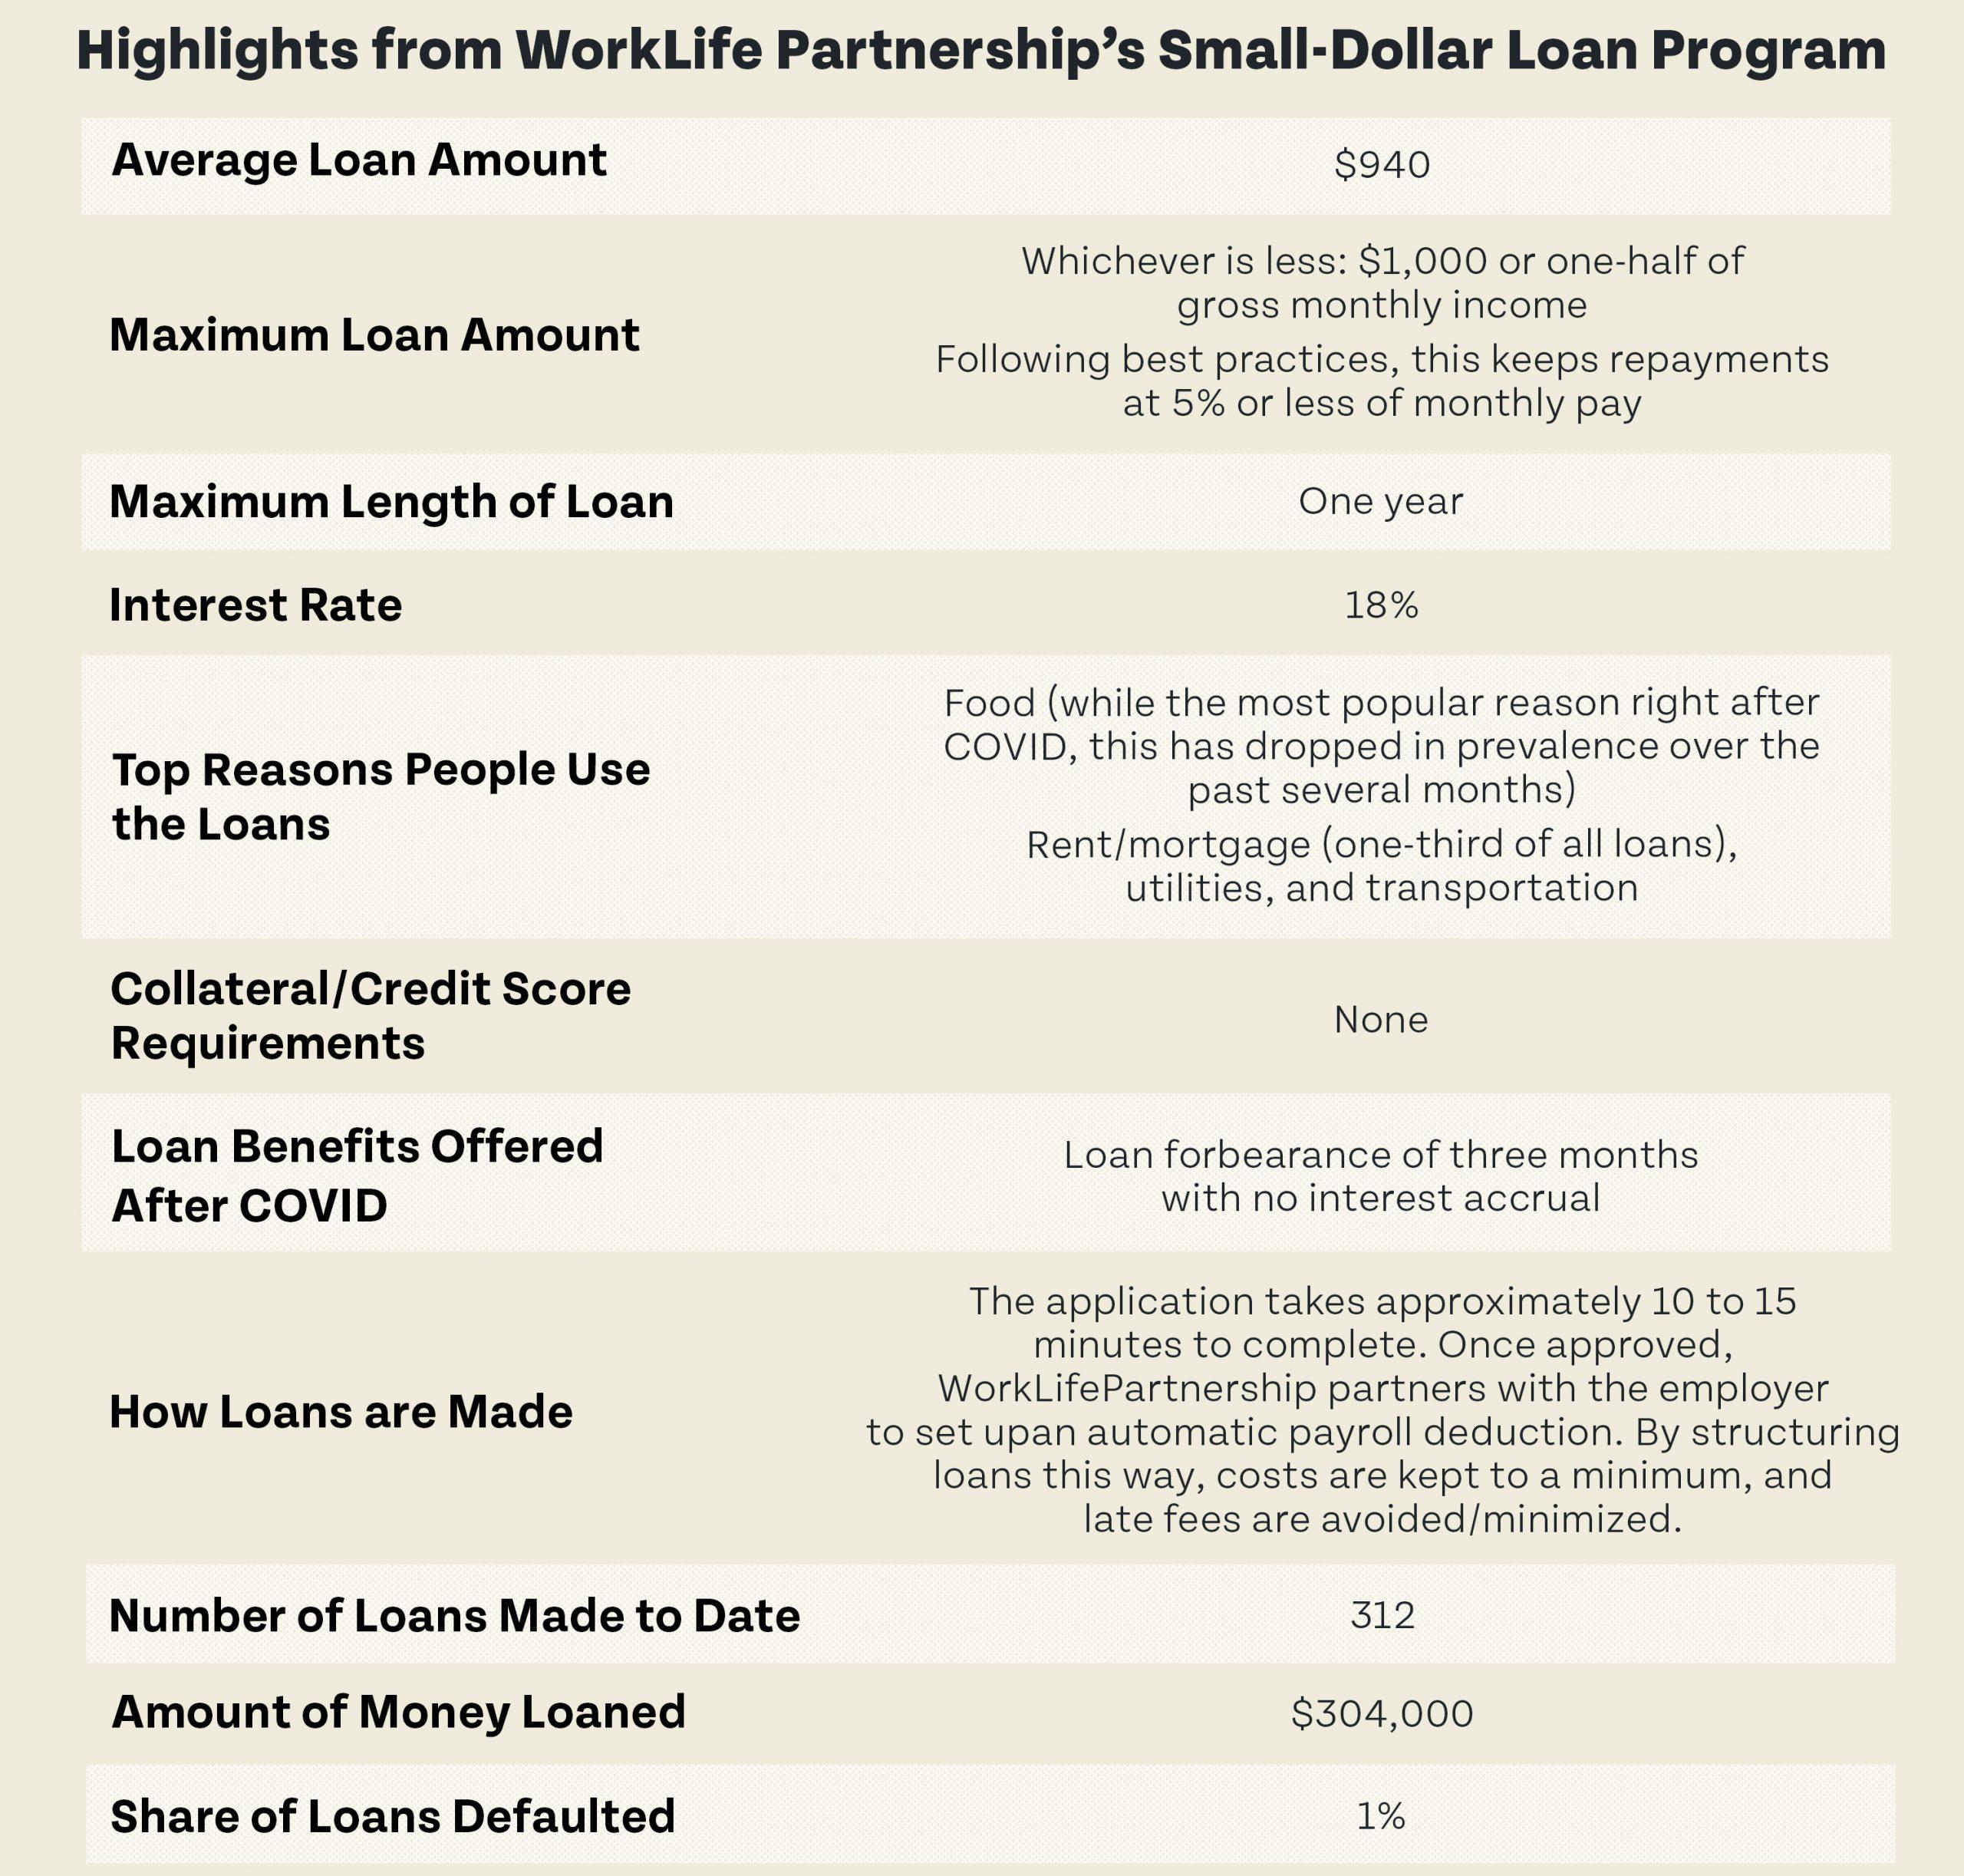 Highlights from WorkLife Partnership's Small-Dollar Loan Program